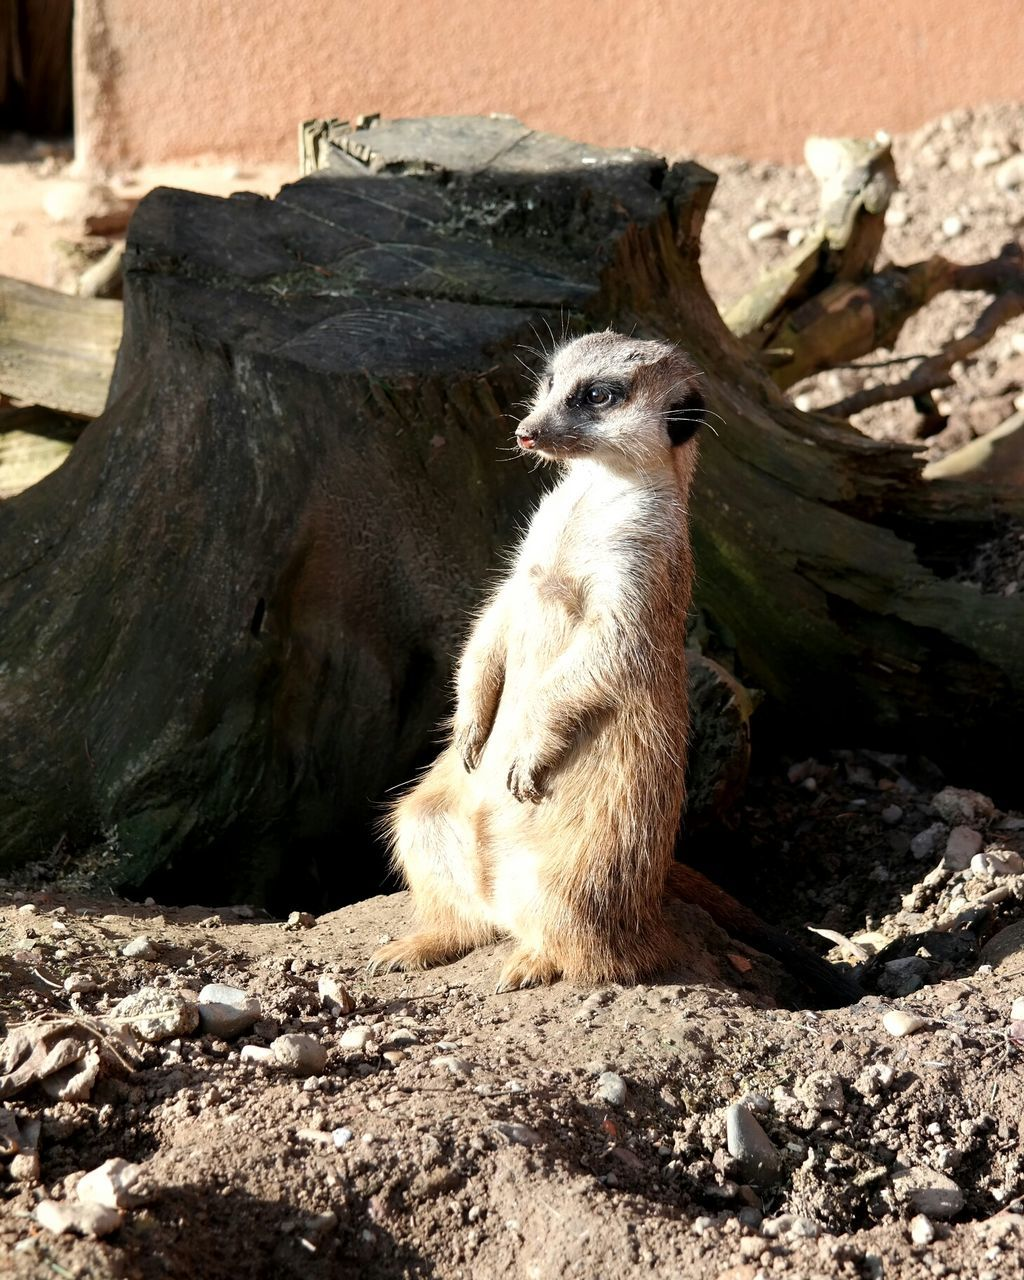 Close-Up Of Meerkat Sitting On Rock